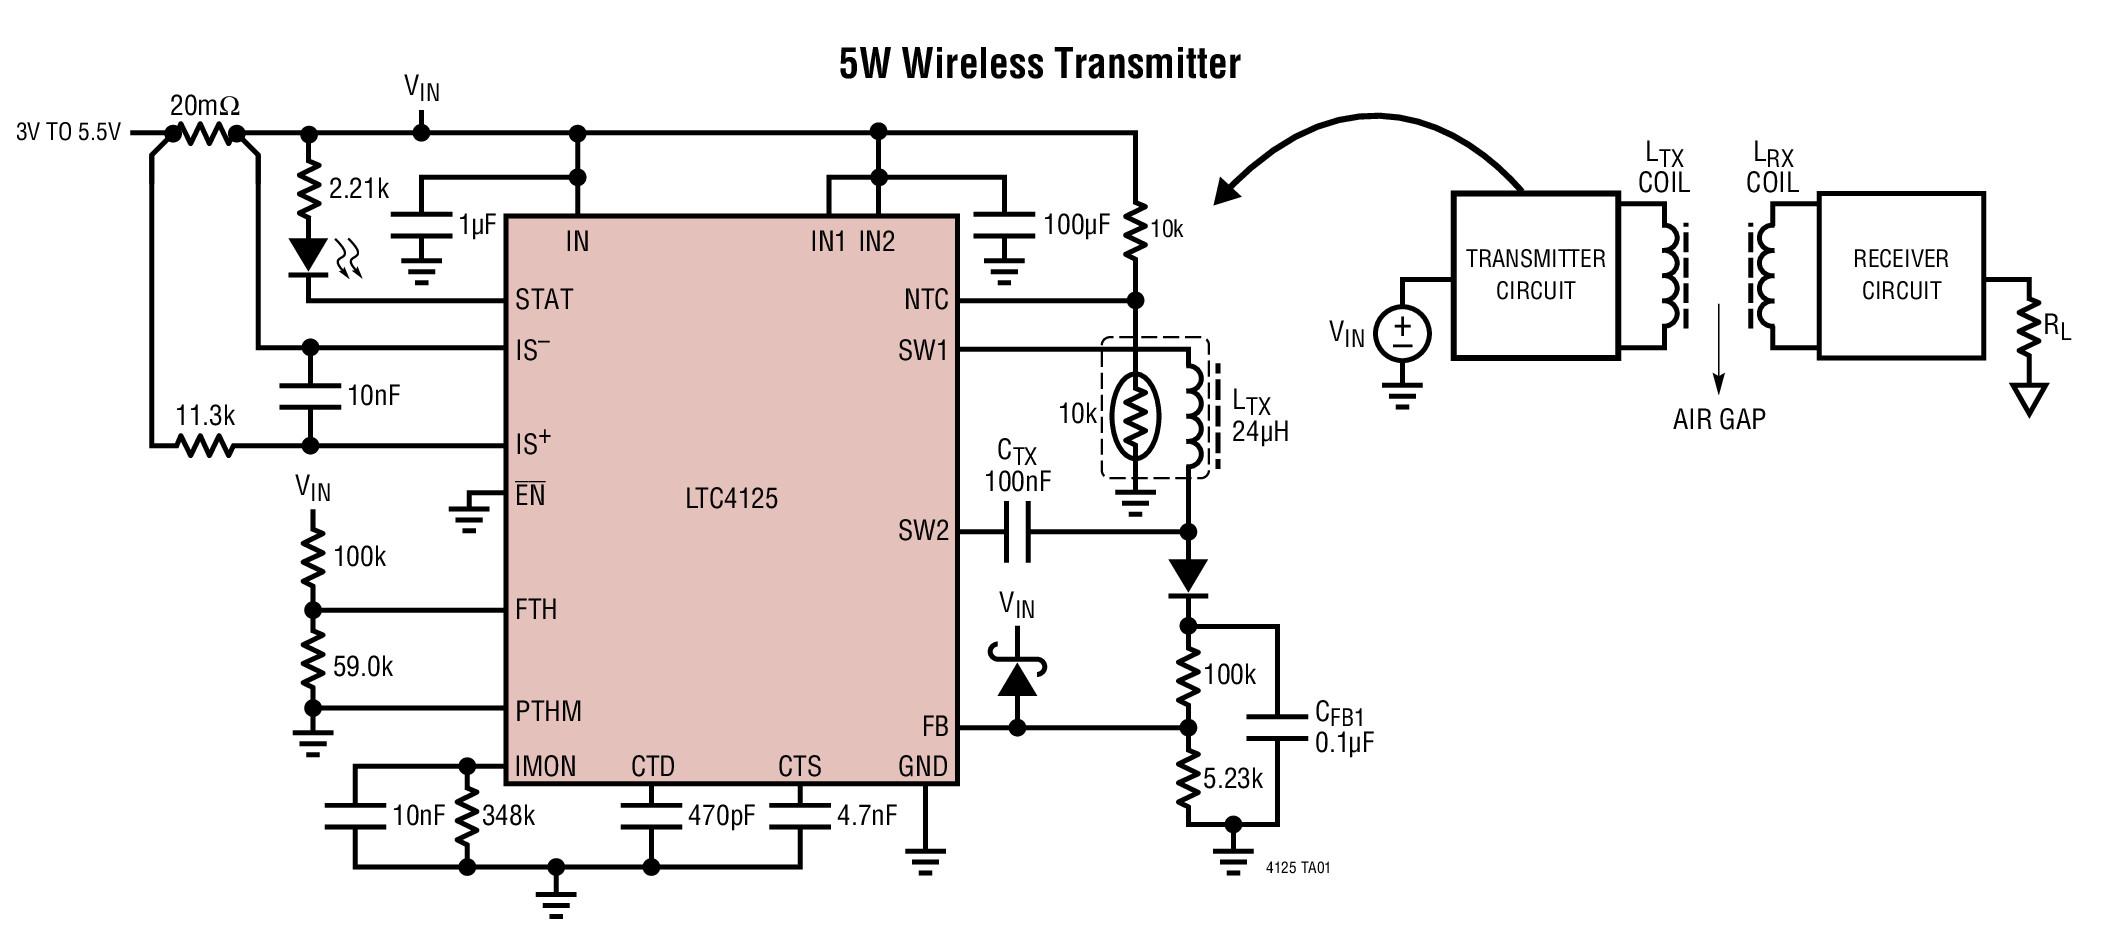 LTC Adds Wireless Power Transmitter